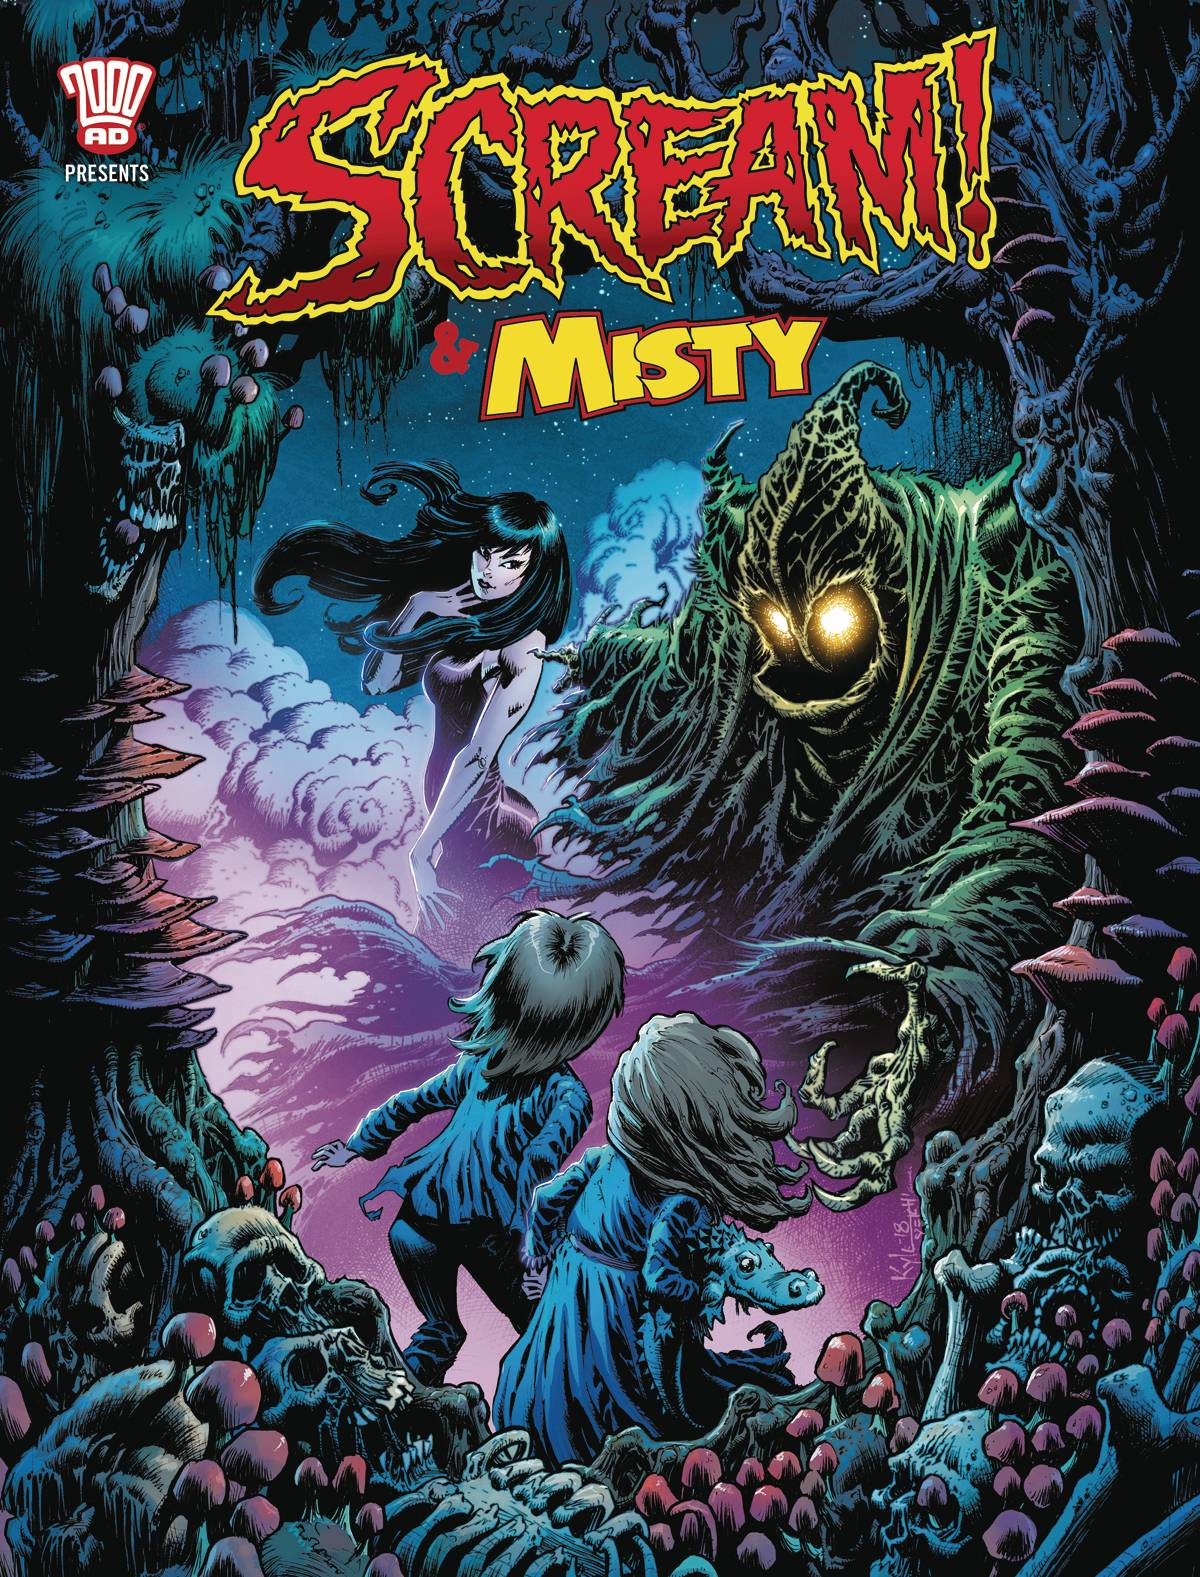 Scream & Misty Halloween Special 2018 #